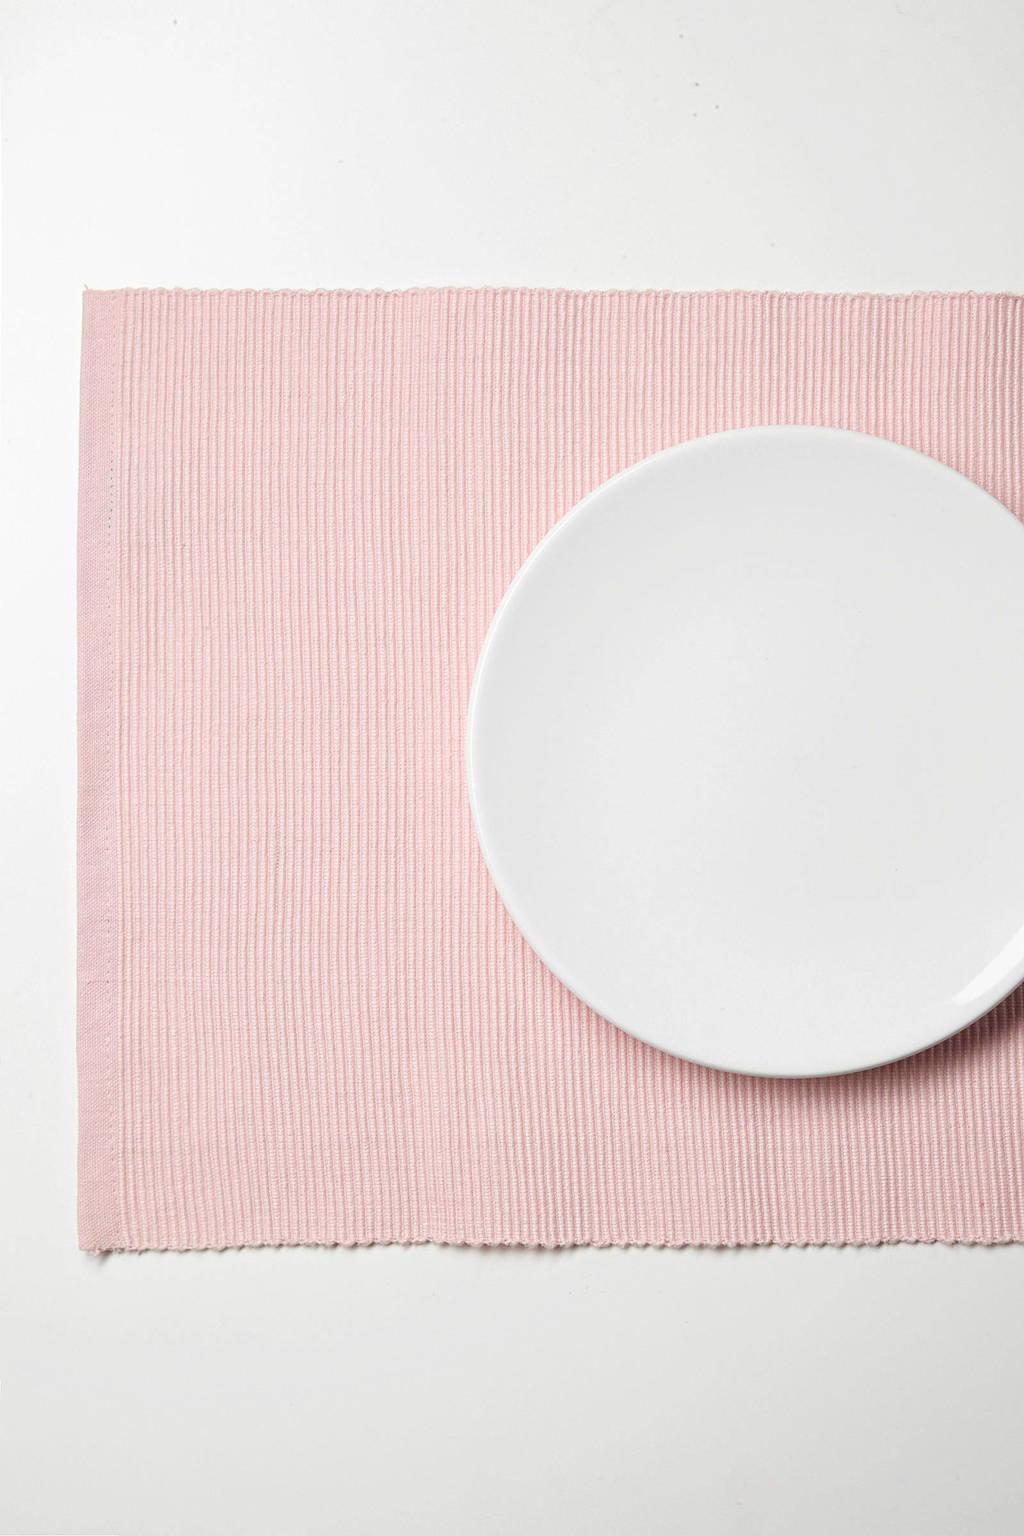 Mood collection placemat Tivoli (33x45 cm) (set van 4), Roze